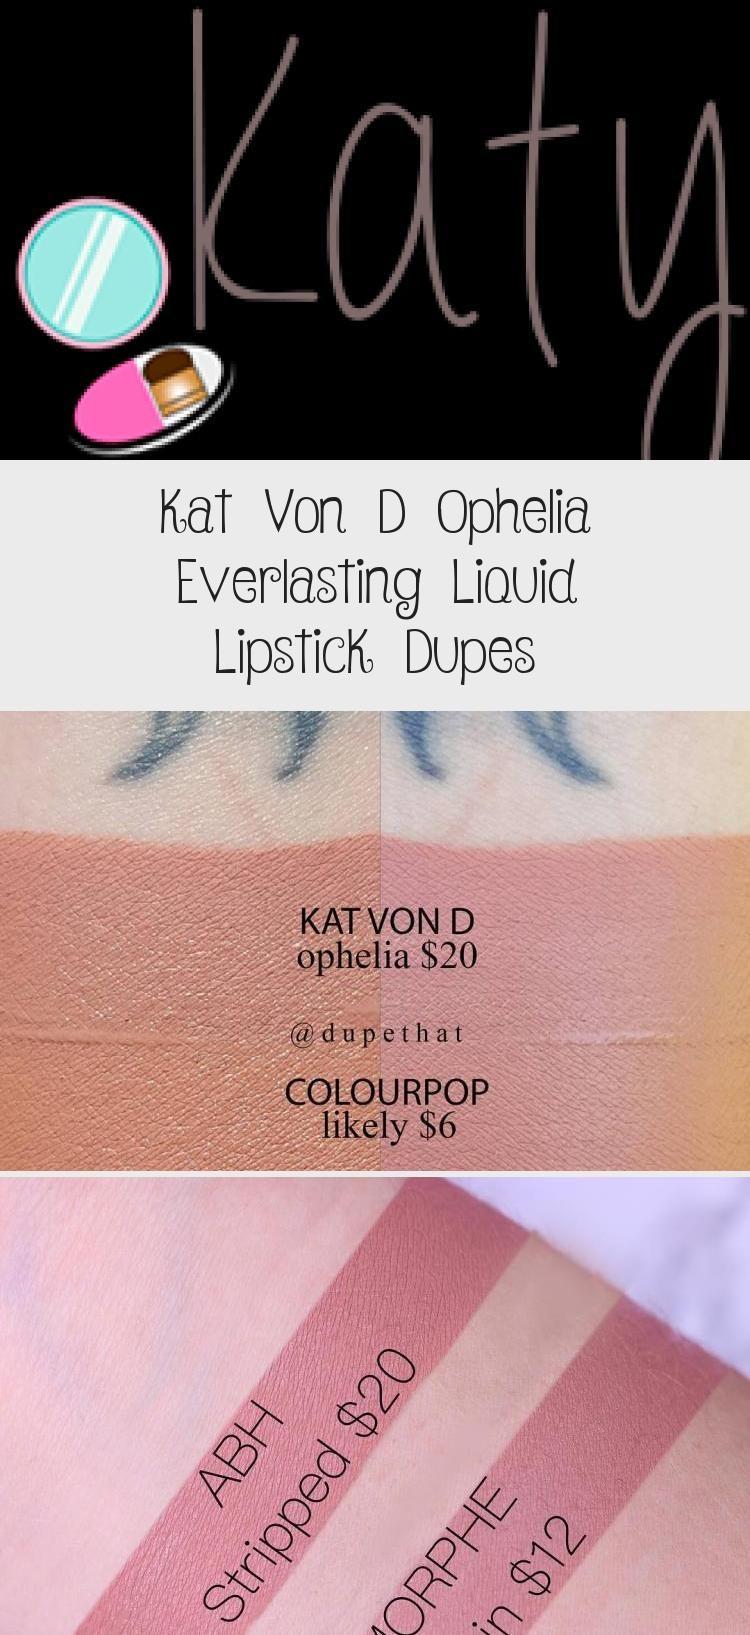 Kat Von D Ophelia Everlasting Liquid Lipstick Dupes